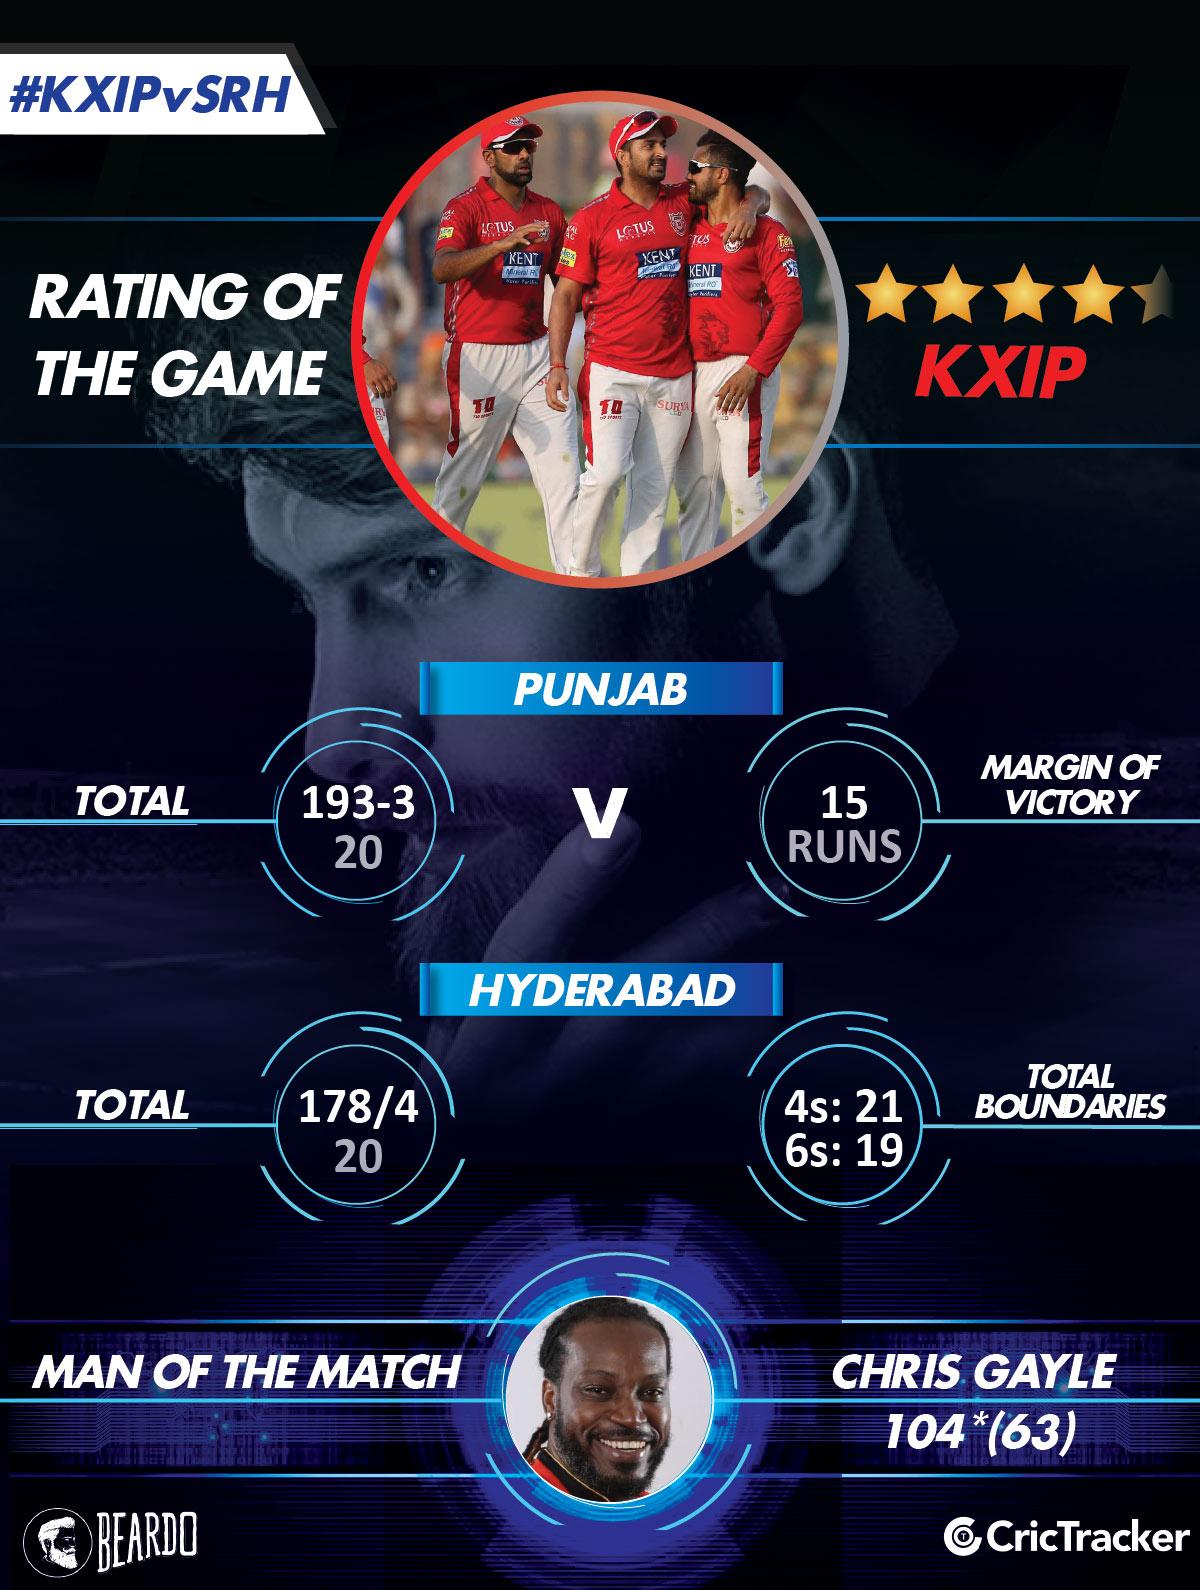 IPL2018-KXIP-VS-SRH-RatinG-of-the-match